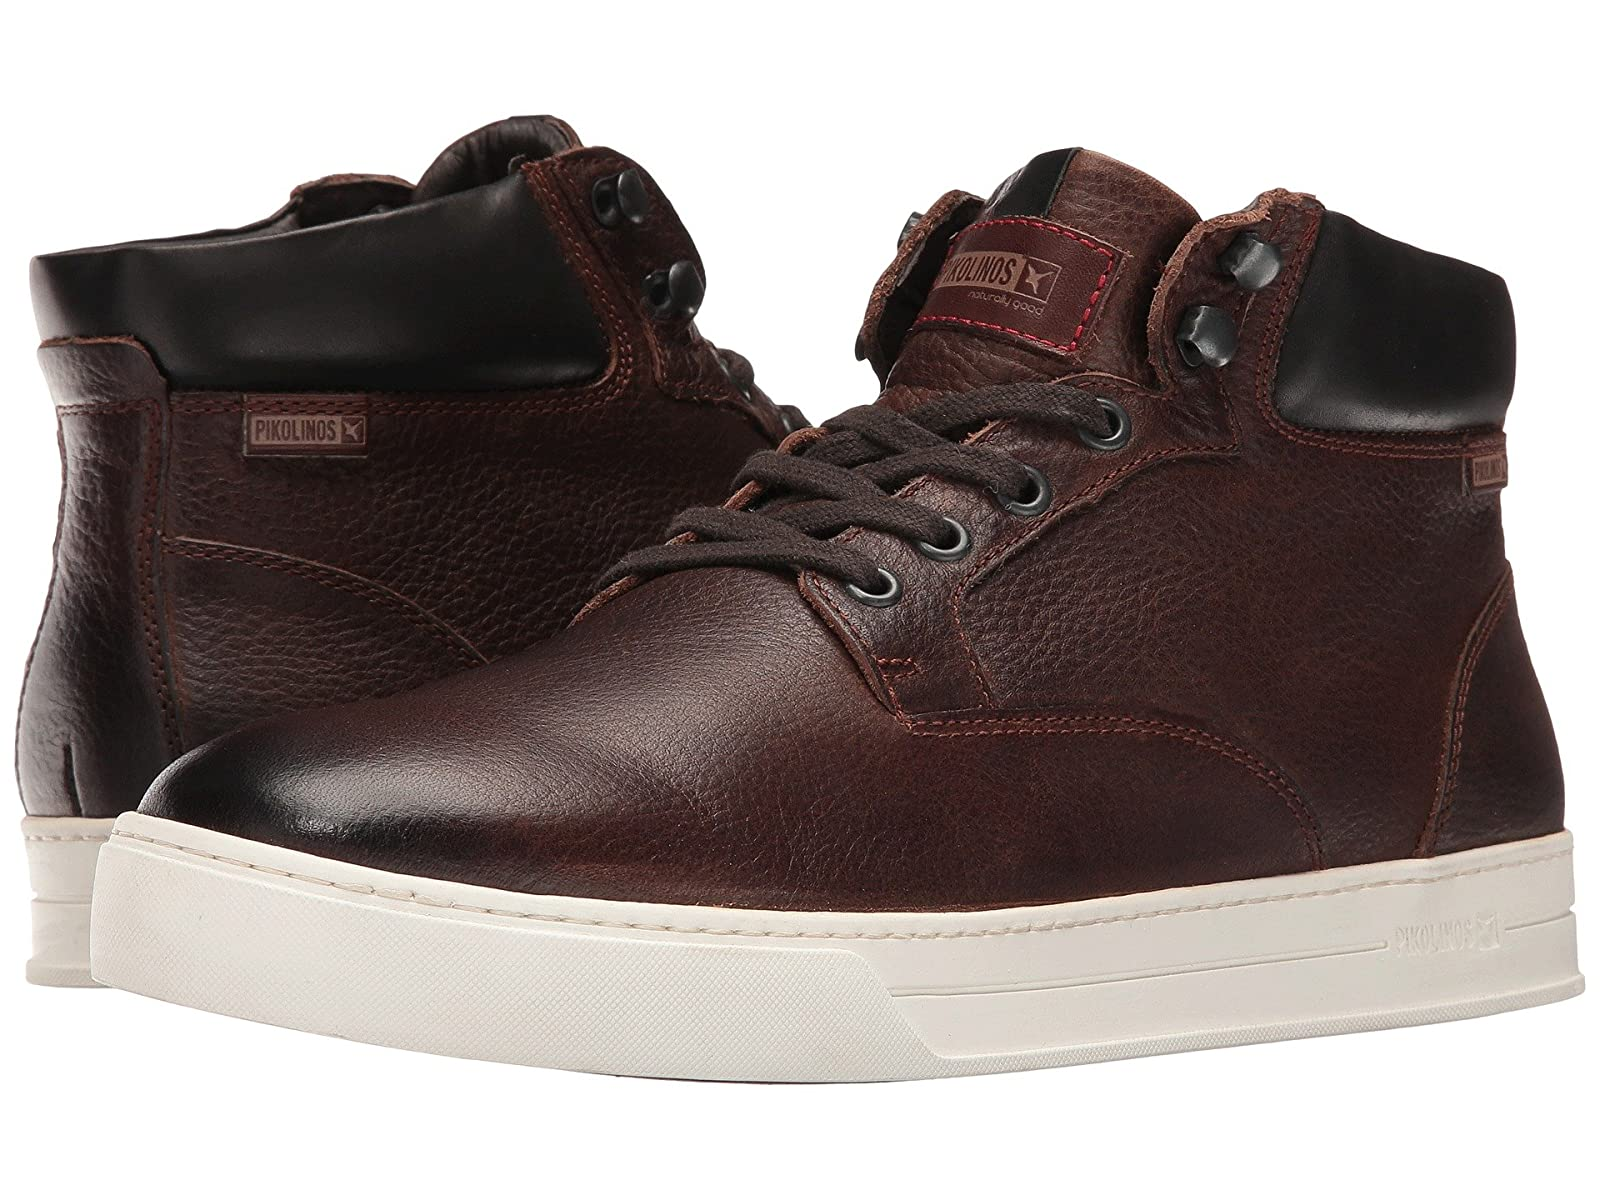 Pikolinos Mackenzie M0C-8103NGCheap and distinctive eye-catching shoes